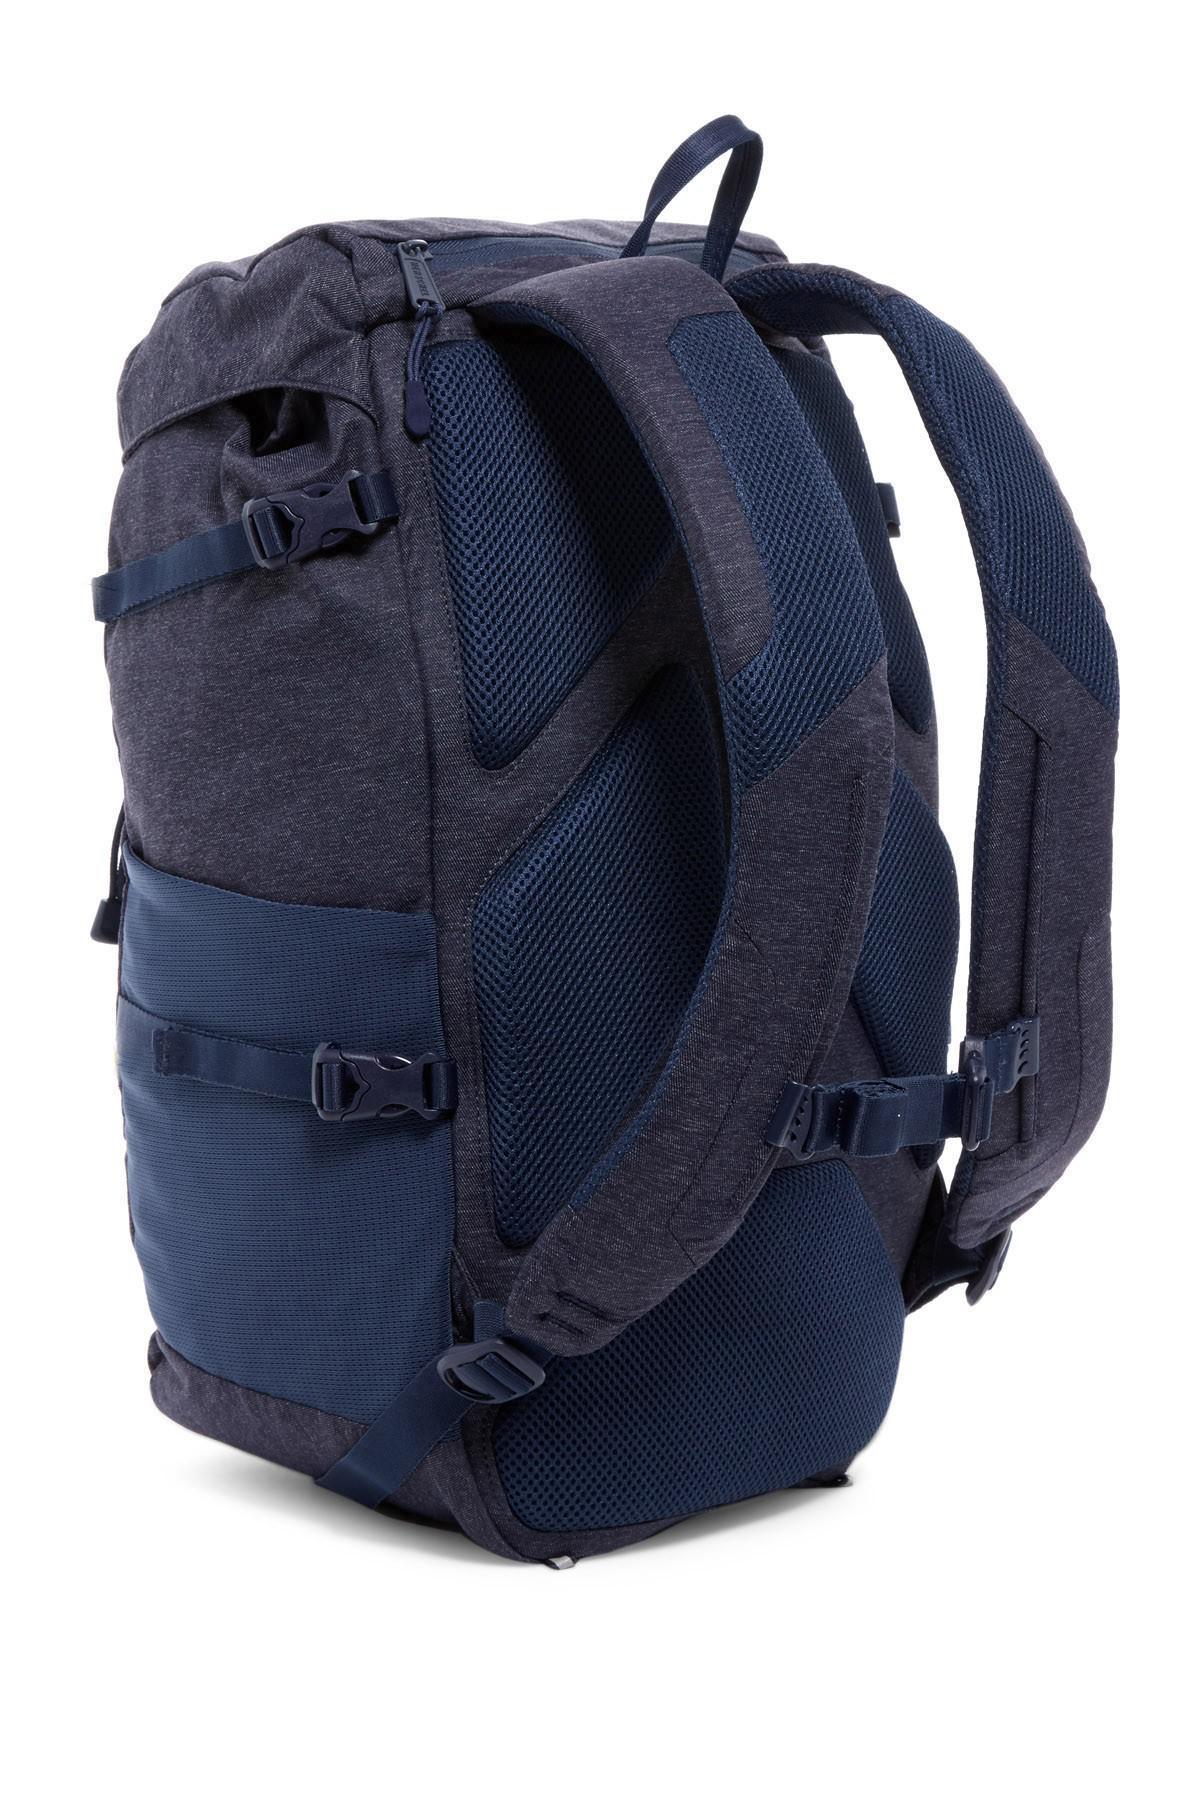 Lyst - Herschel Supply Co. Barlow Large Backpack in Blue for Men 80341913139ed